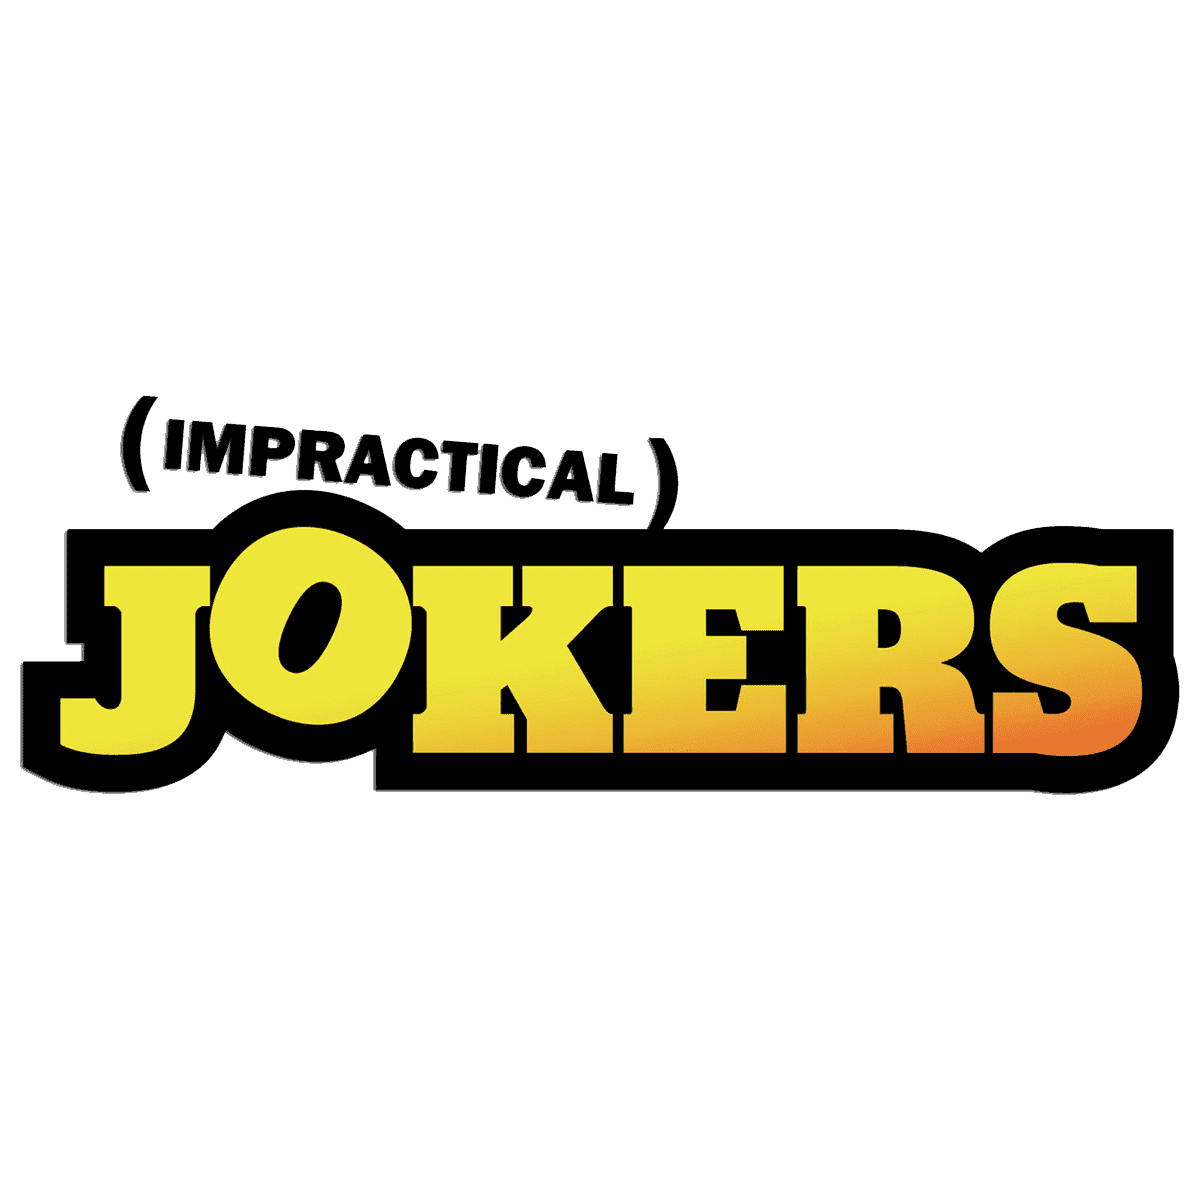 Impractical Jokers Logo